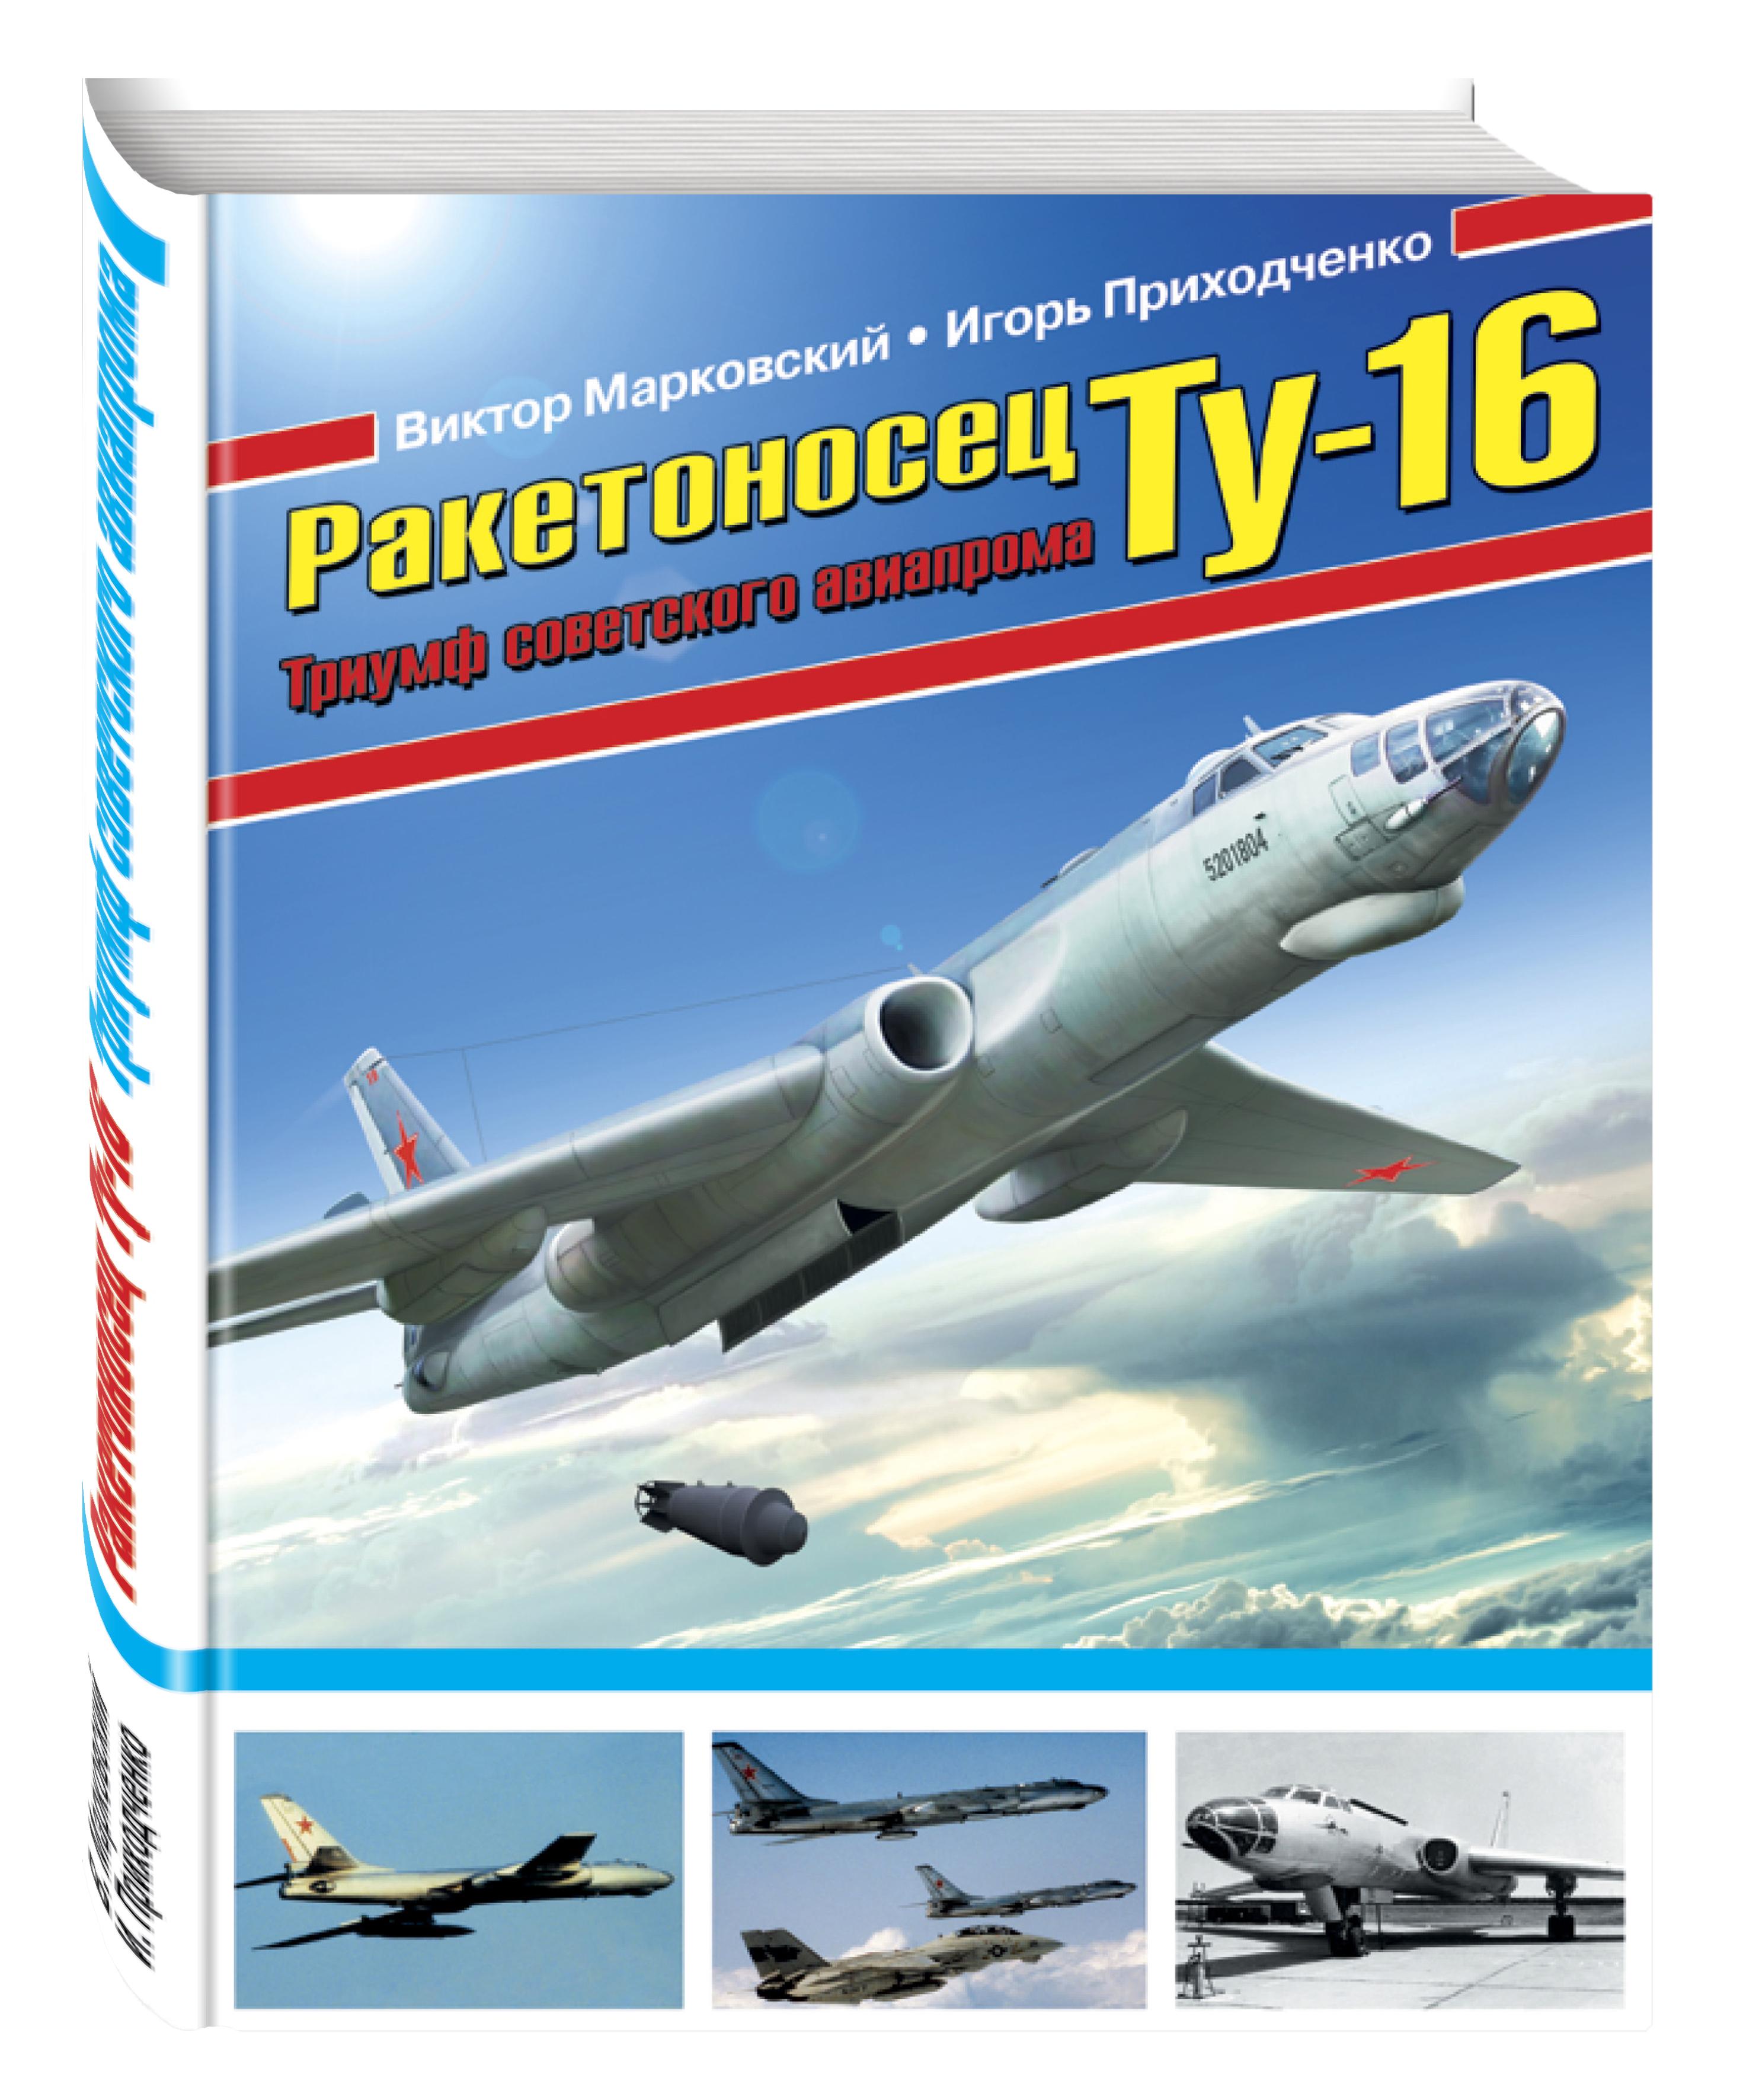 Ракетоносец Ту-16. Триумф советского авиапрома